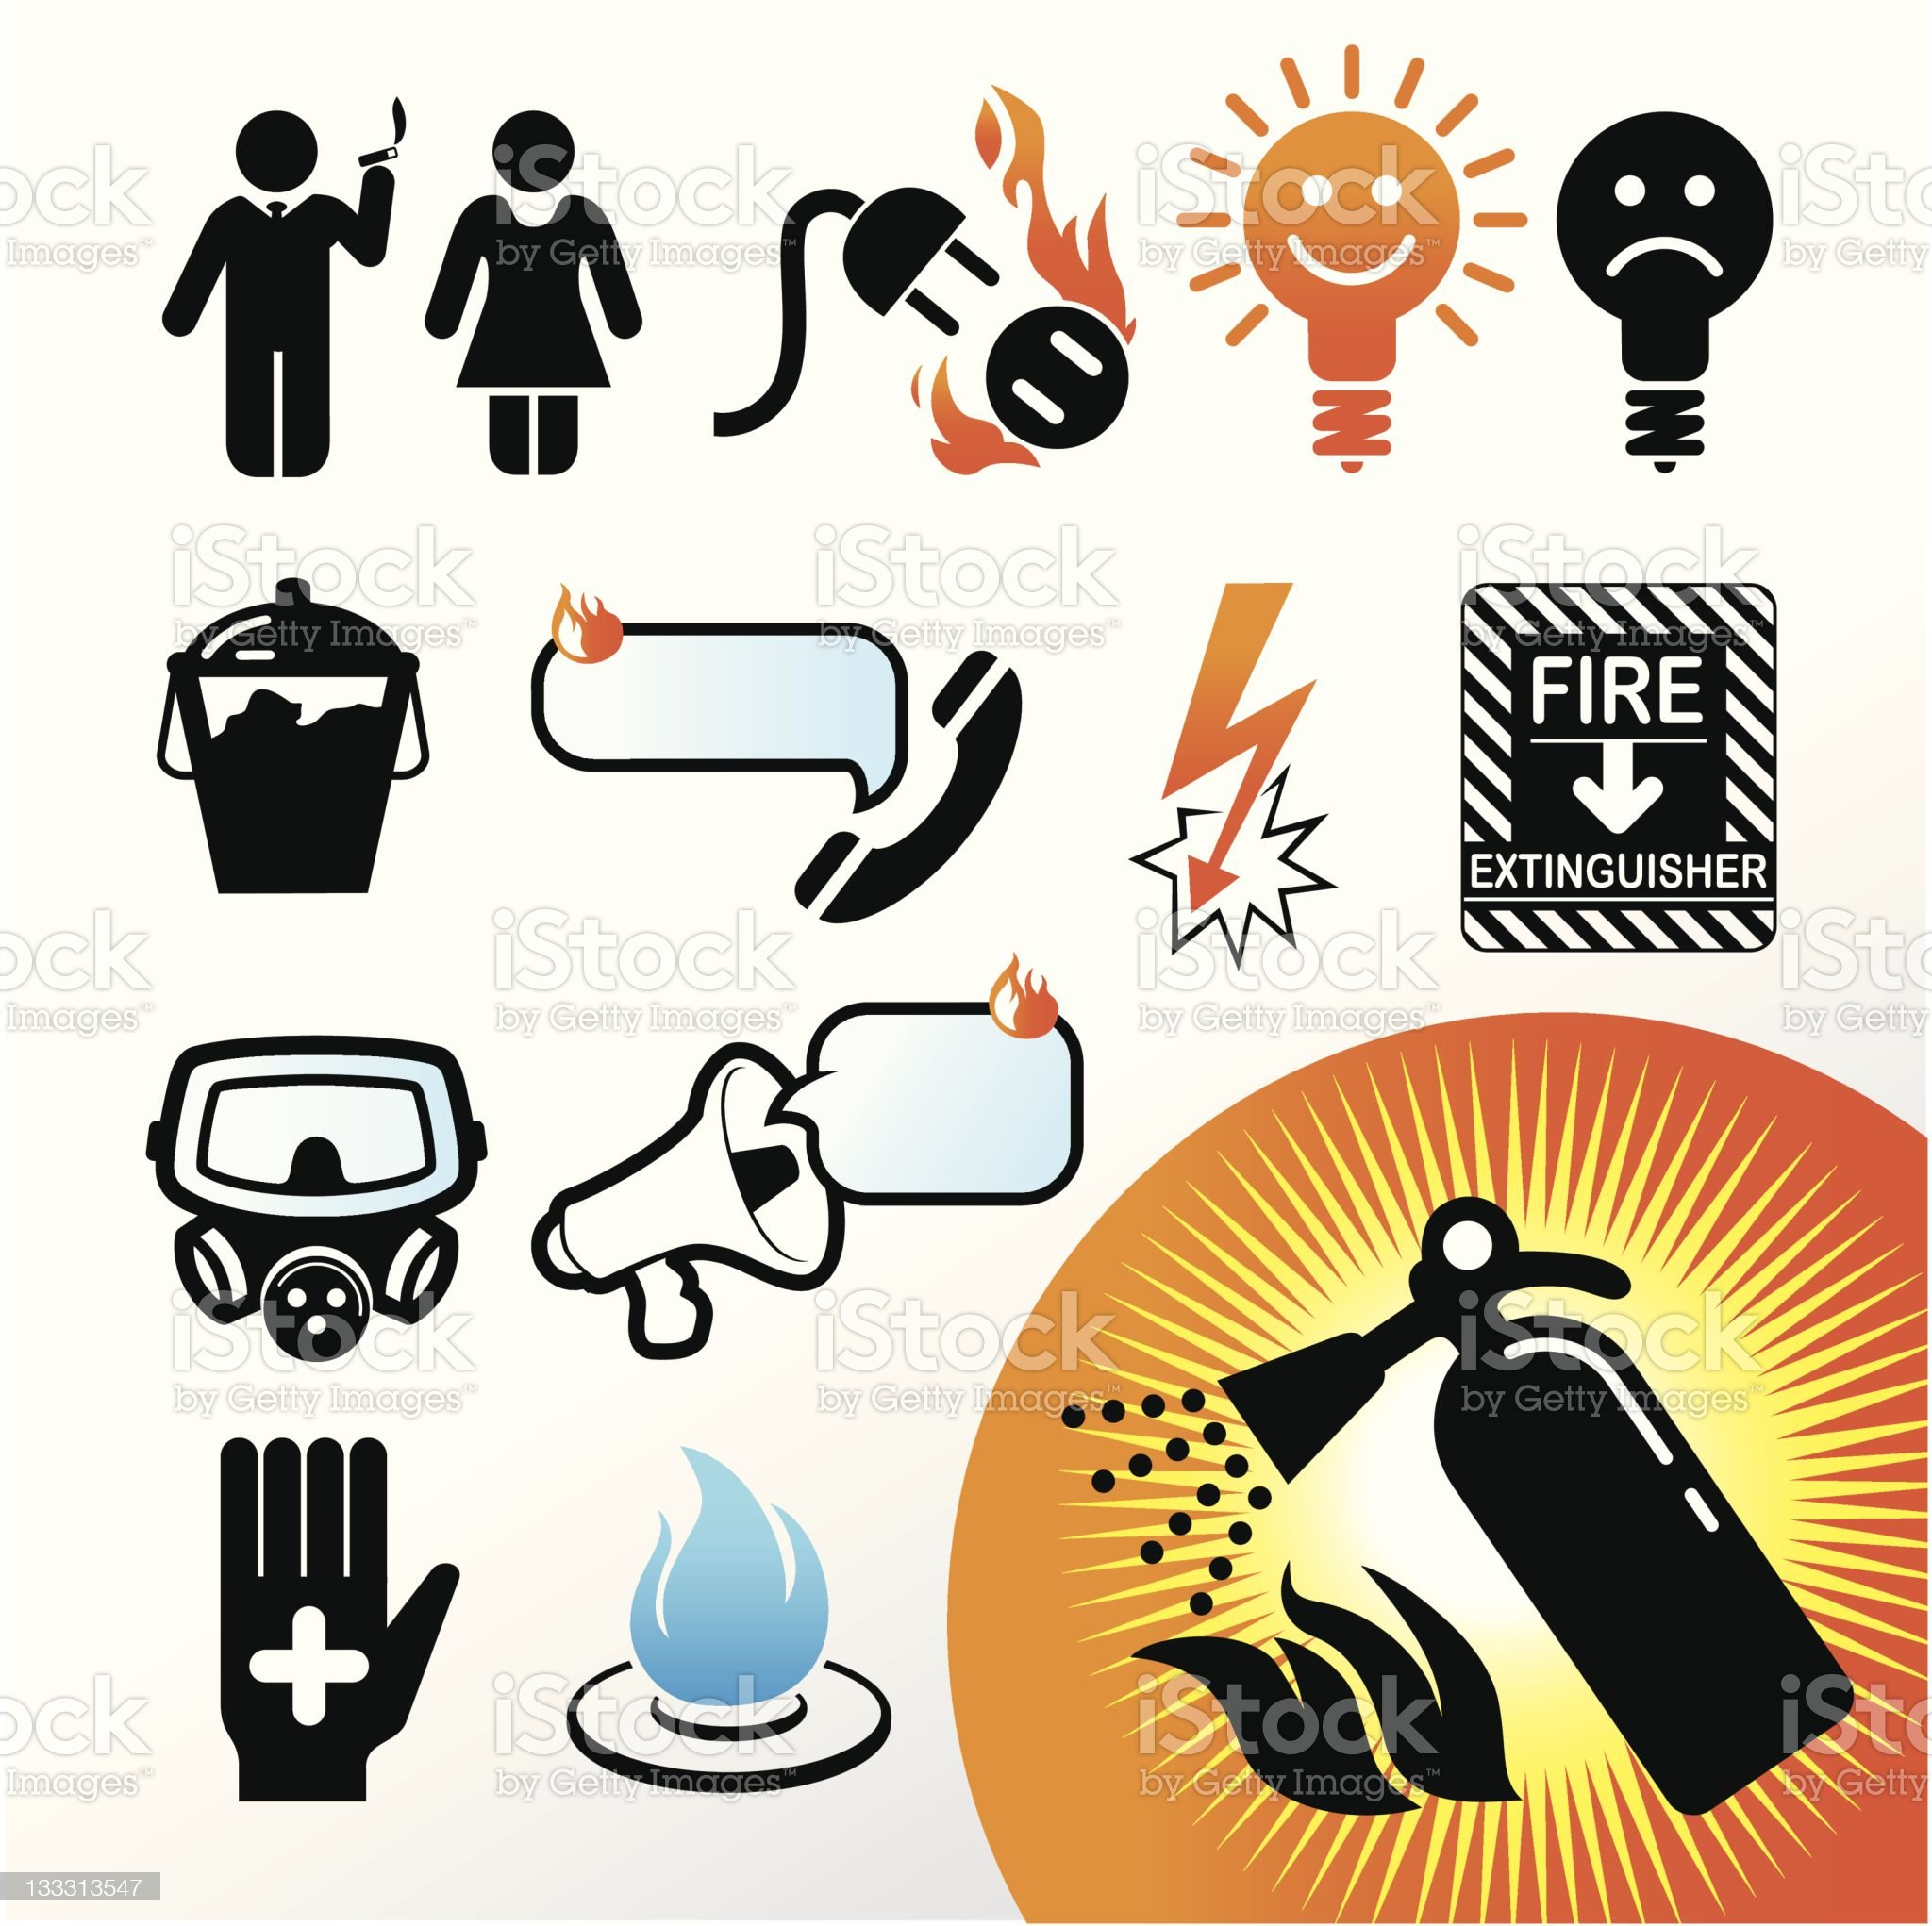 symbol extinguisher royalty-free stock vector art